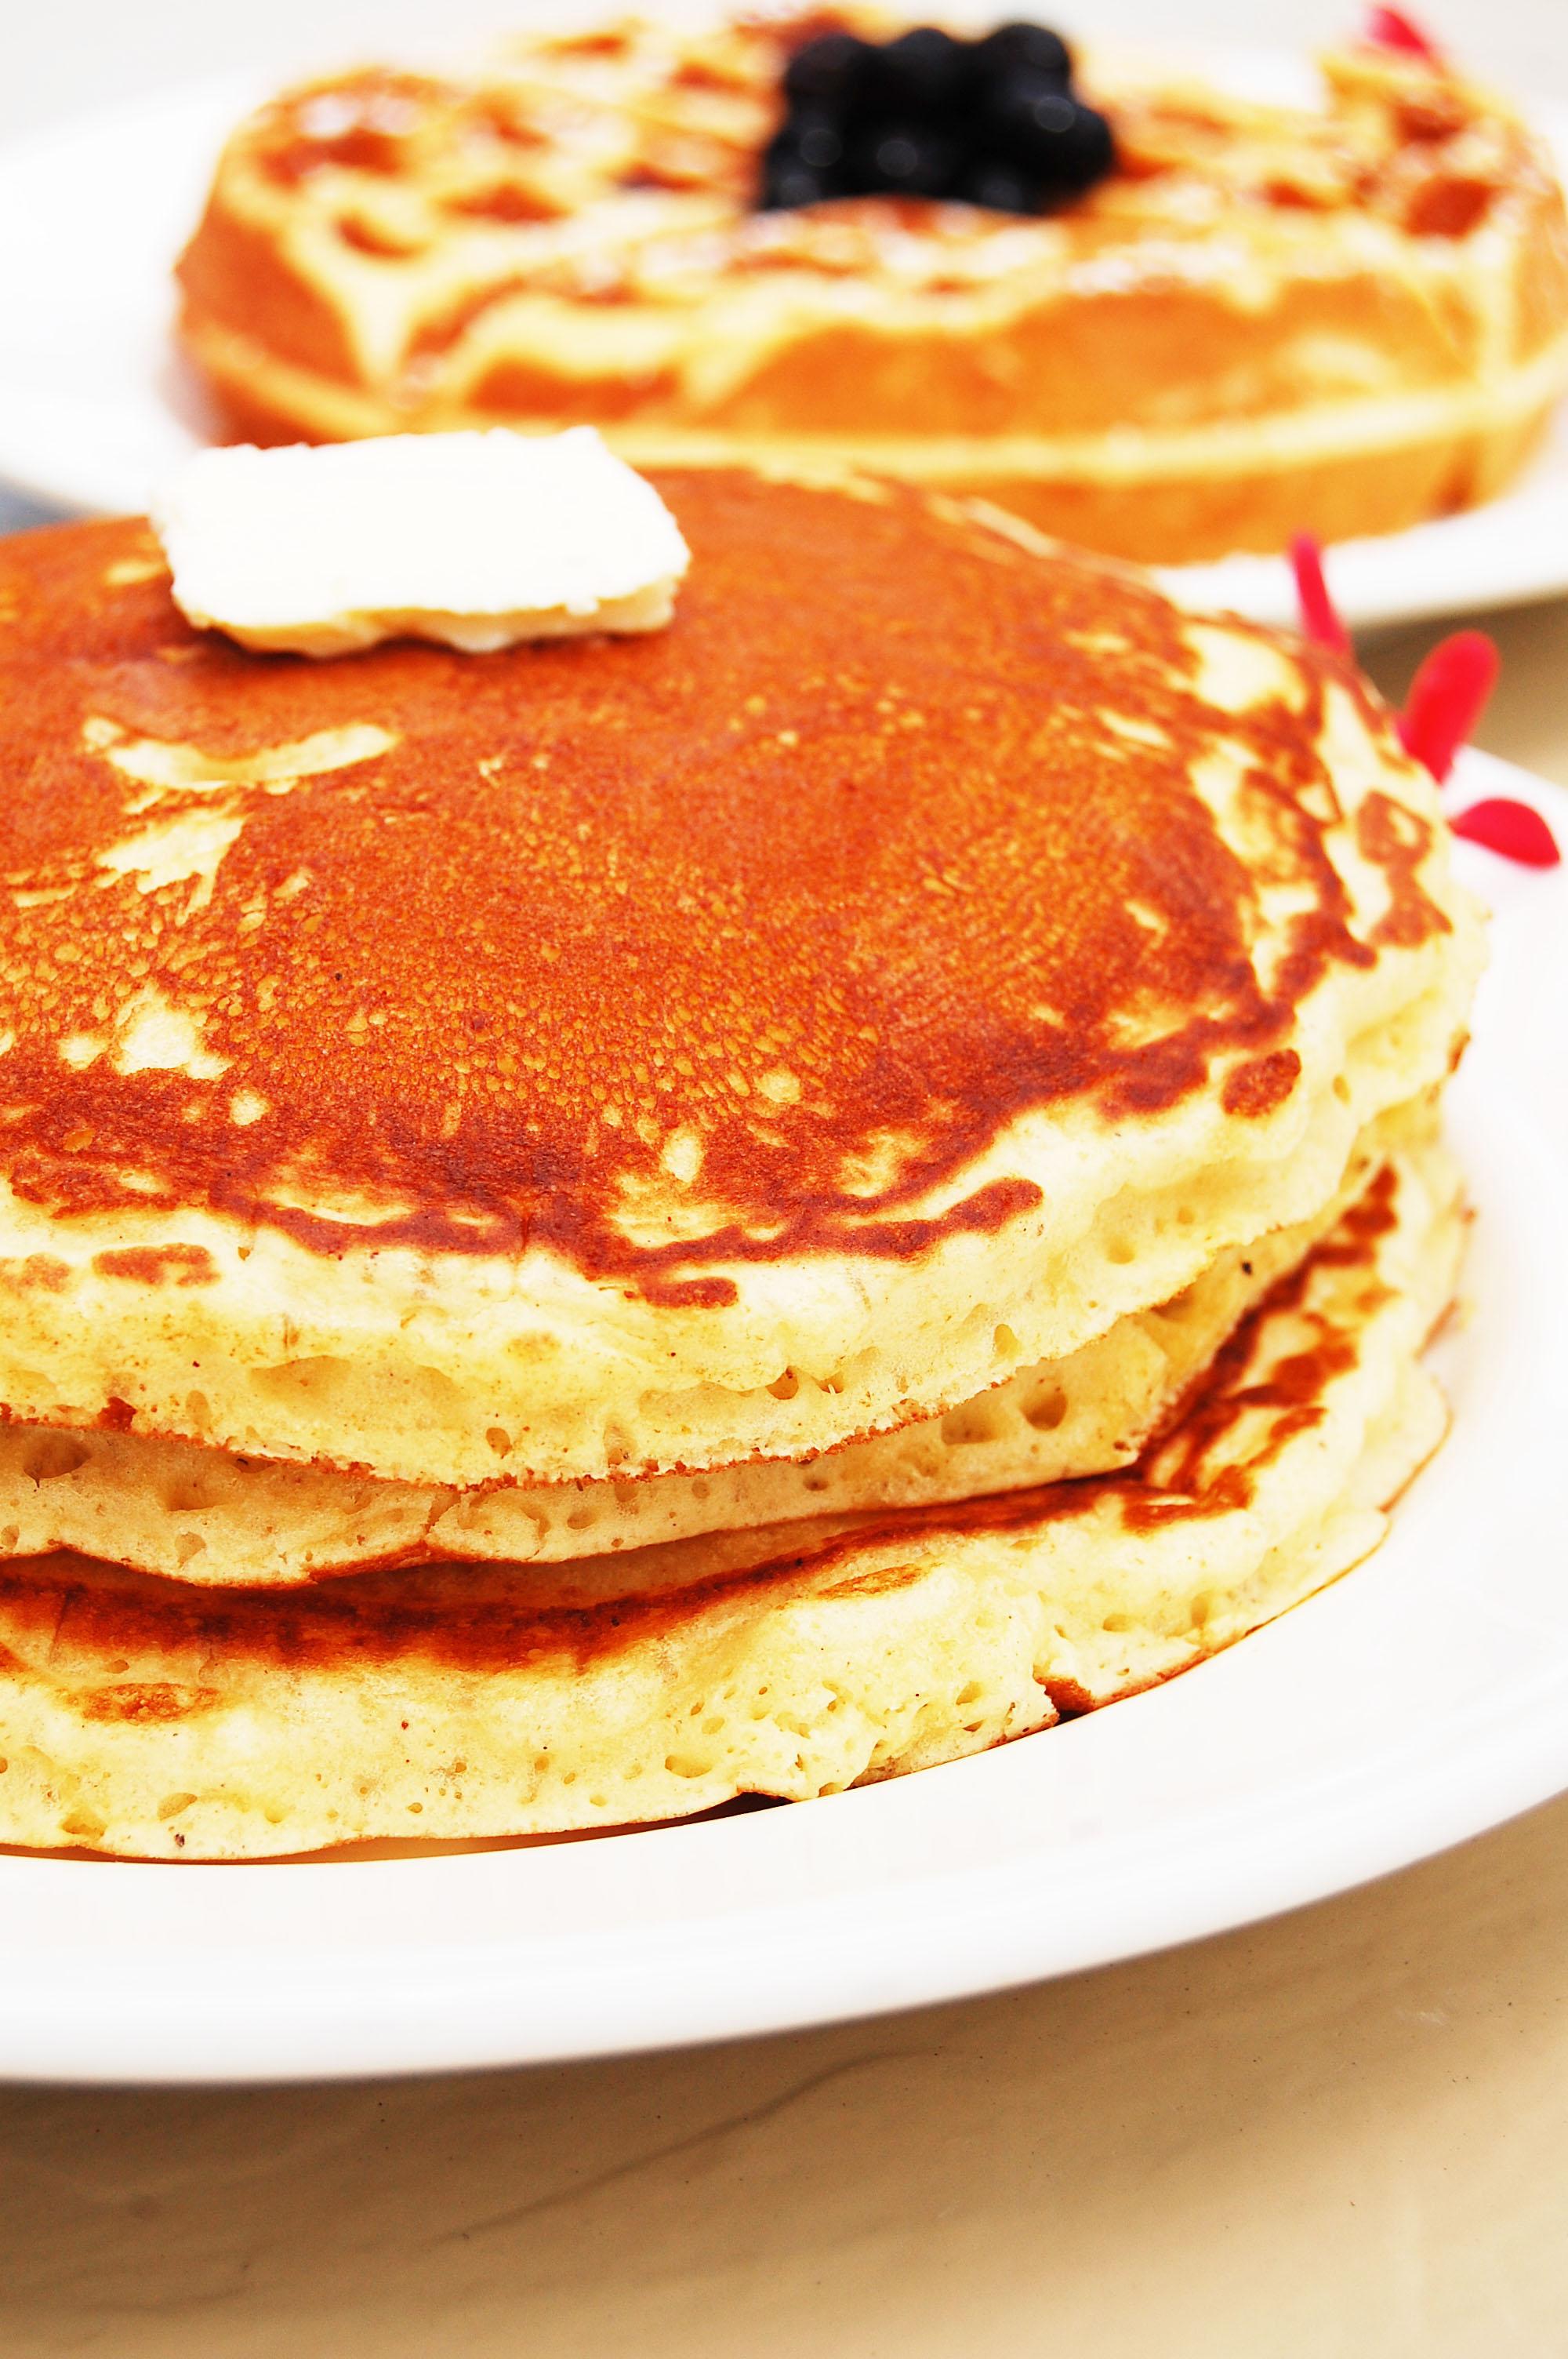 original 3 stack hotcakes.jpg